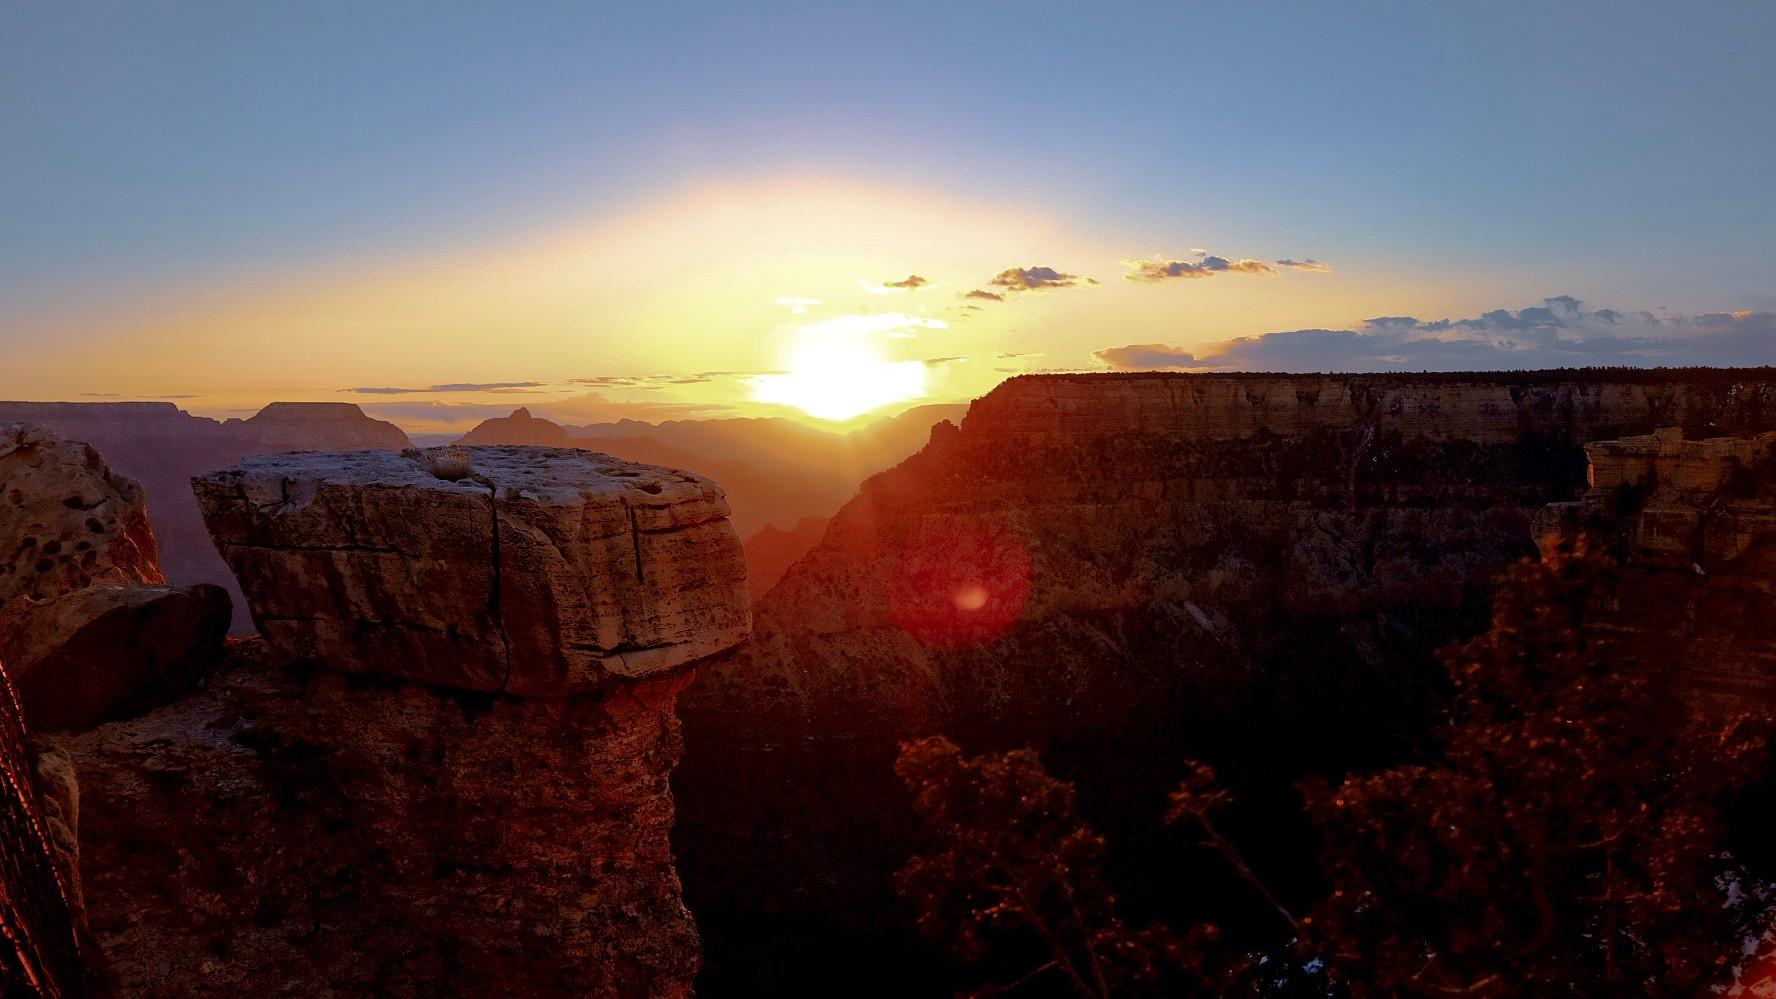 Sunrise at Great Canyon